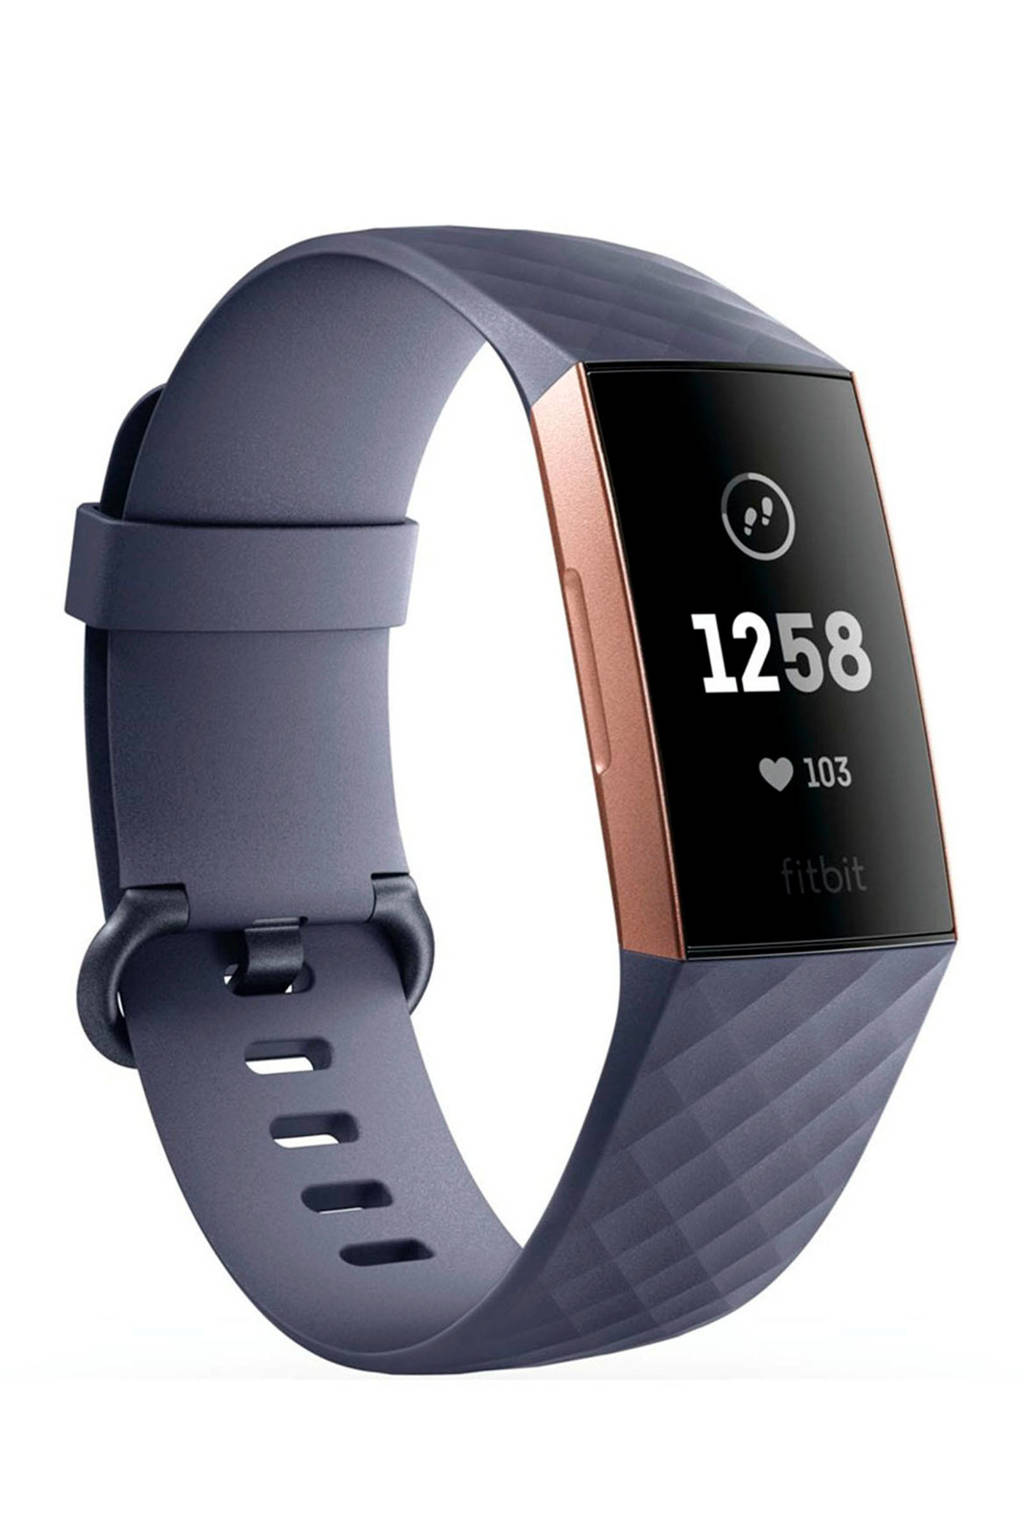 Fitbit Charge 3 activiteiten tracker, -